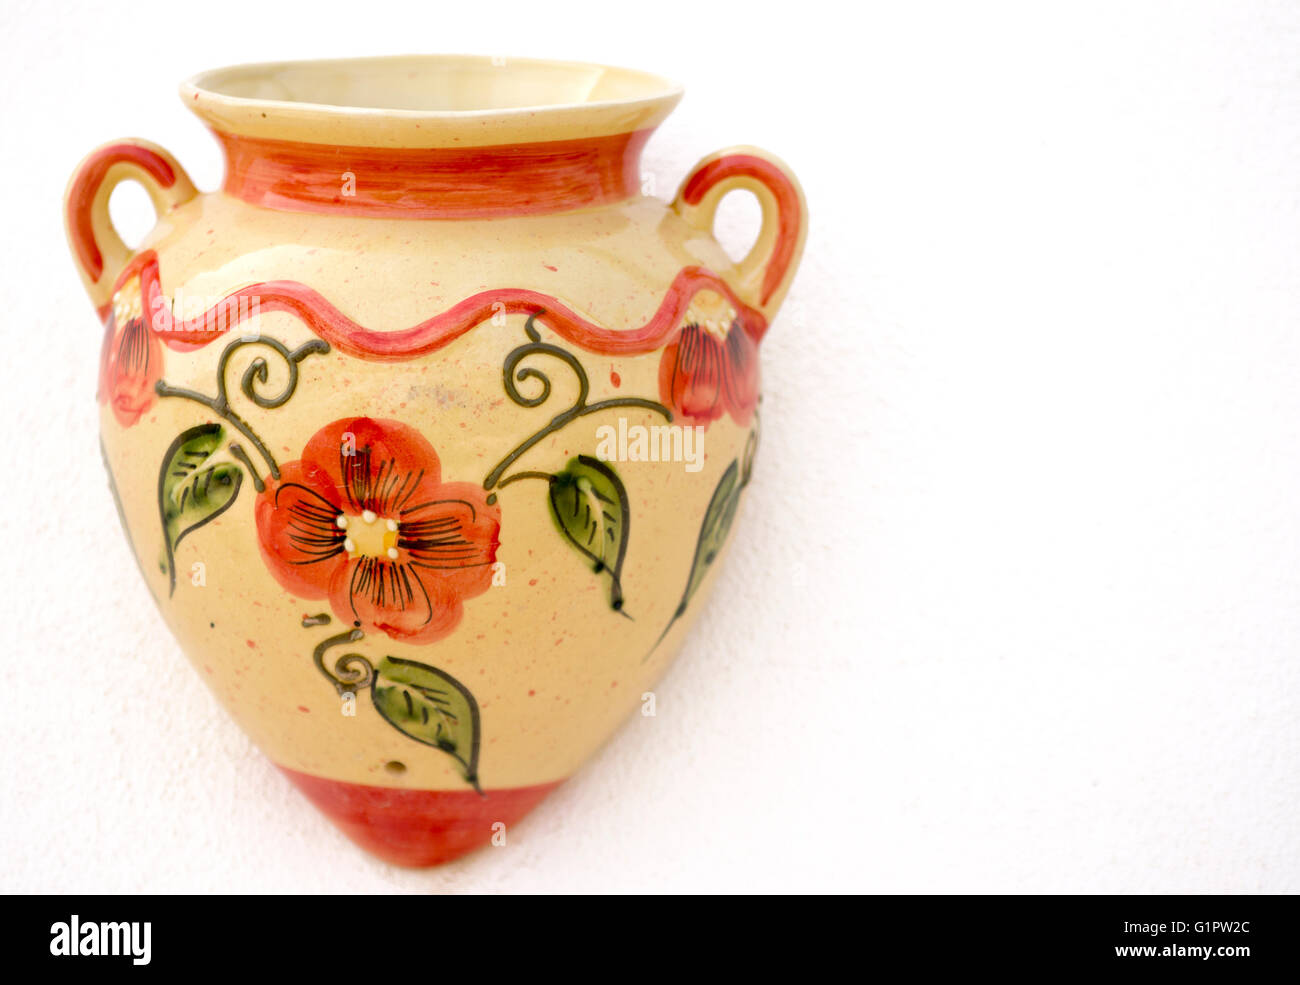 ceramic urn stockfotos ceramic urn bilder alamy. Black Bedroom Furniture Sets. Home Design Ideas